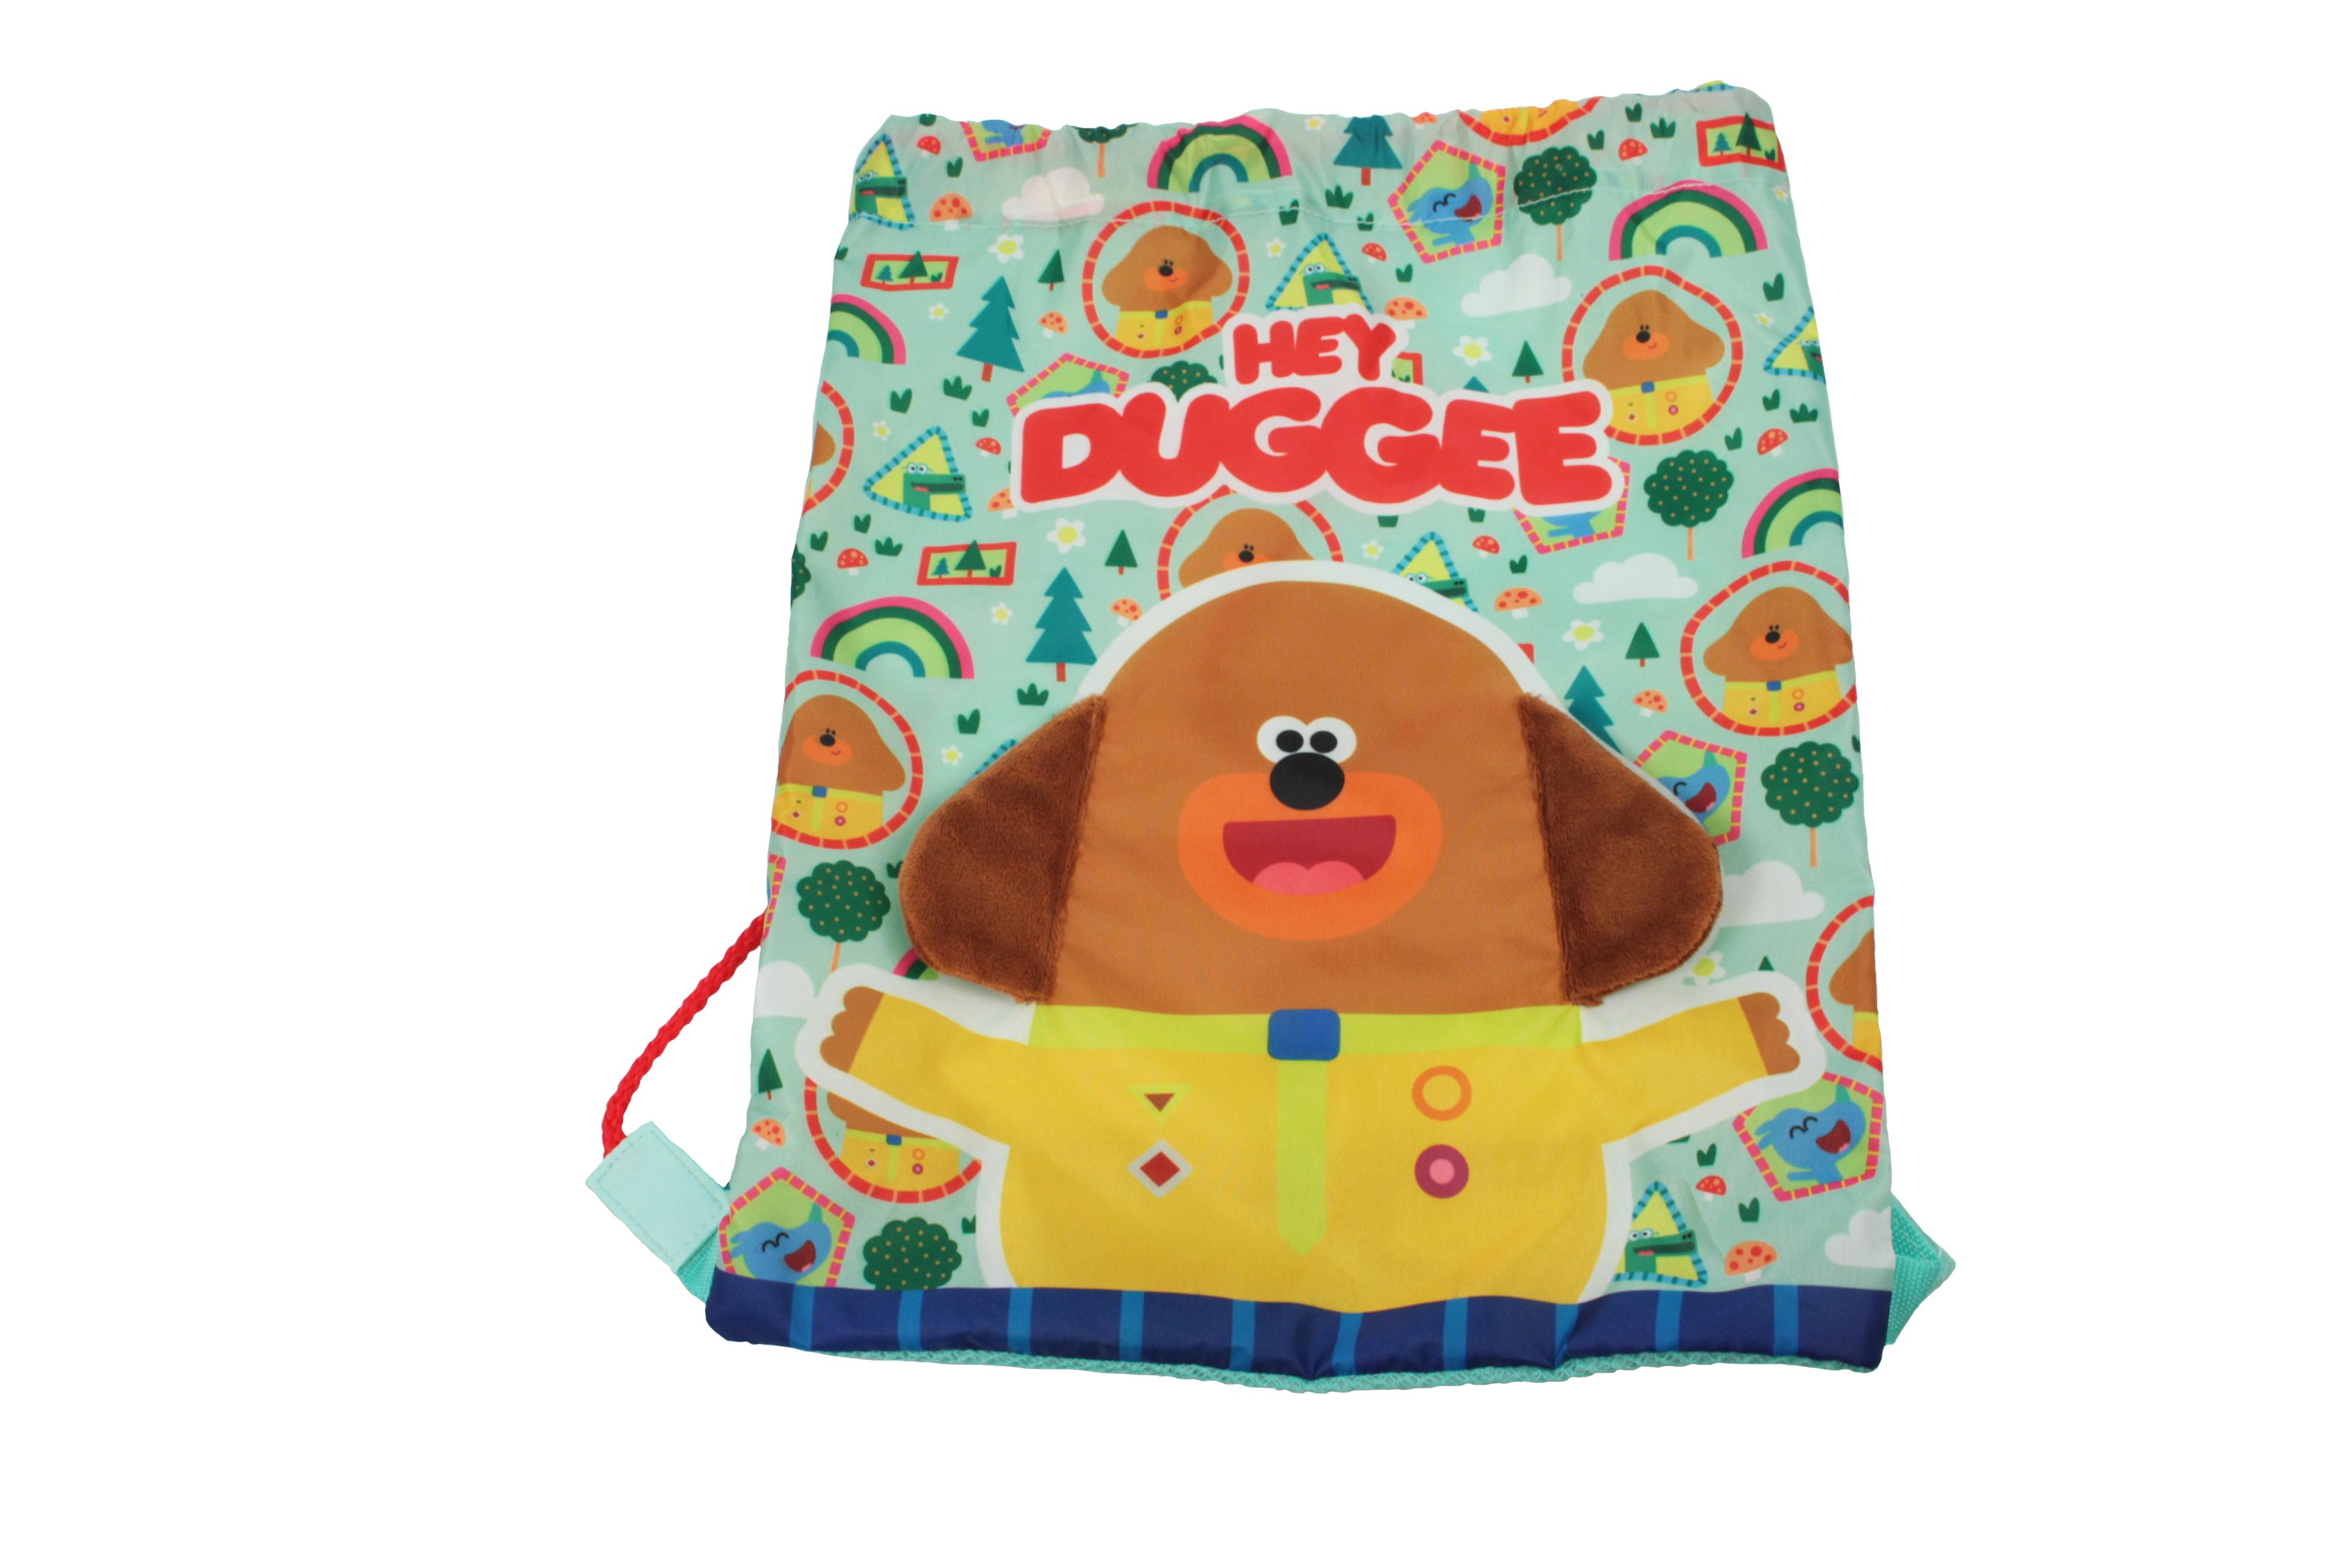 Disney Pixar Toy Story Torso Drawstring Sports Trainer Bag